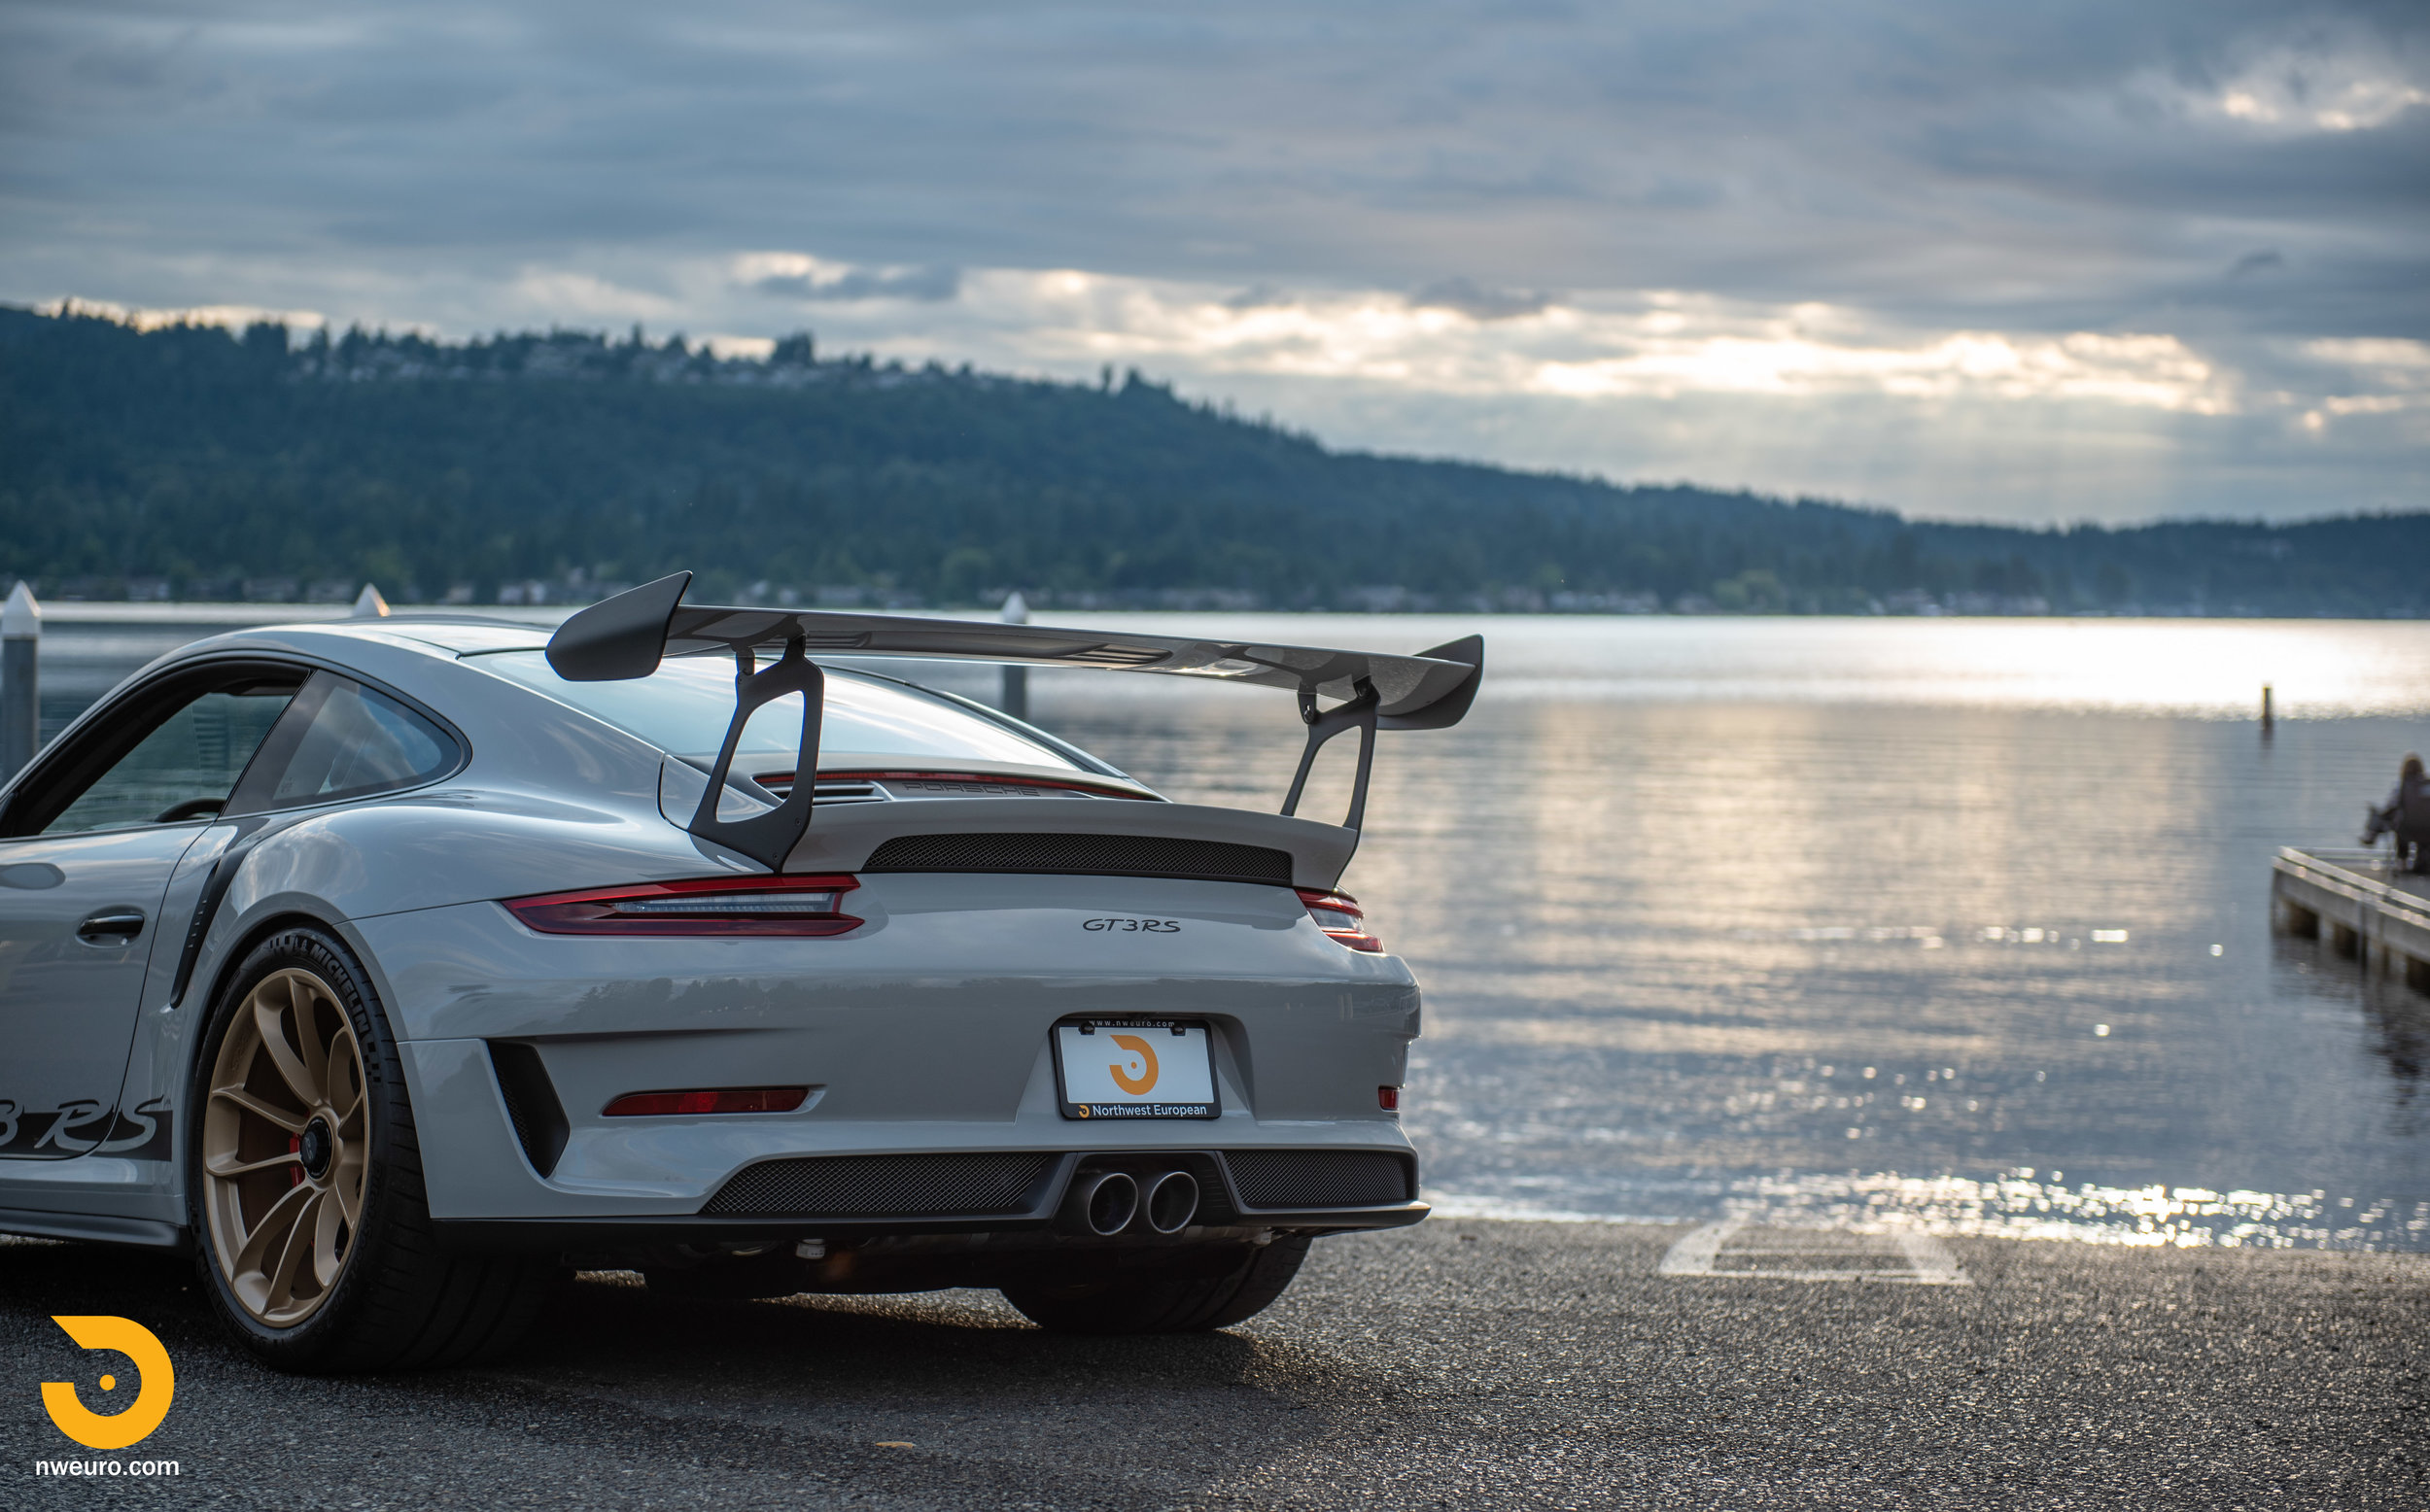 2019 Porsche GT3 RS - Chalk-82.jpg